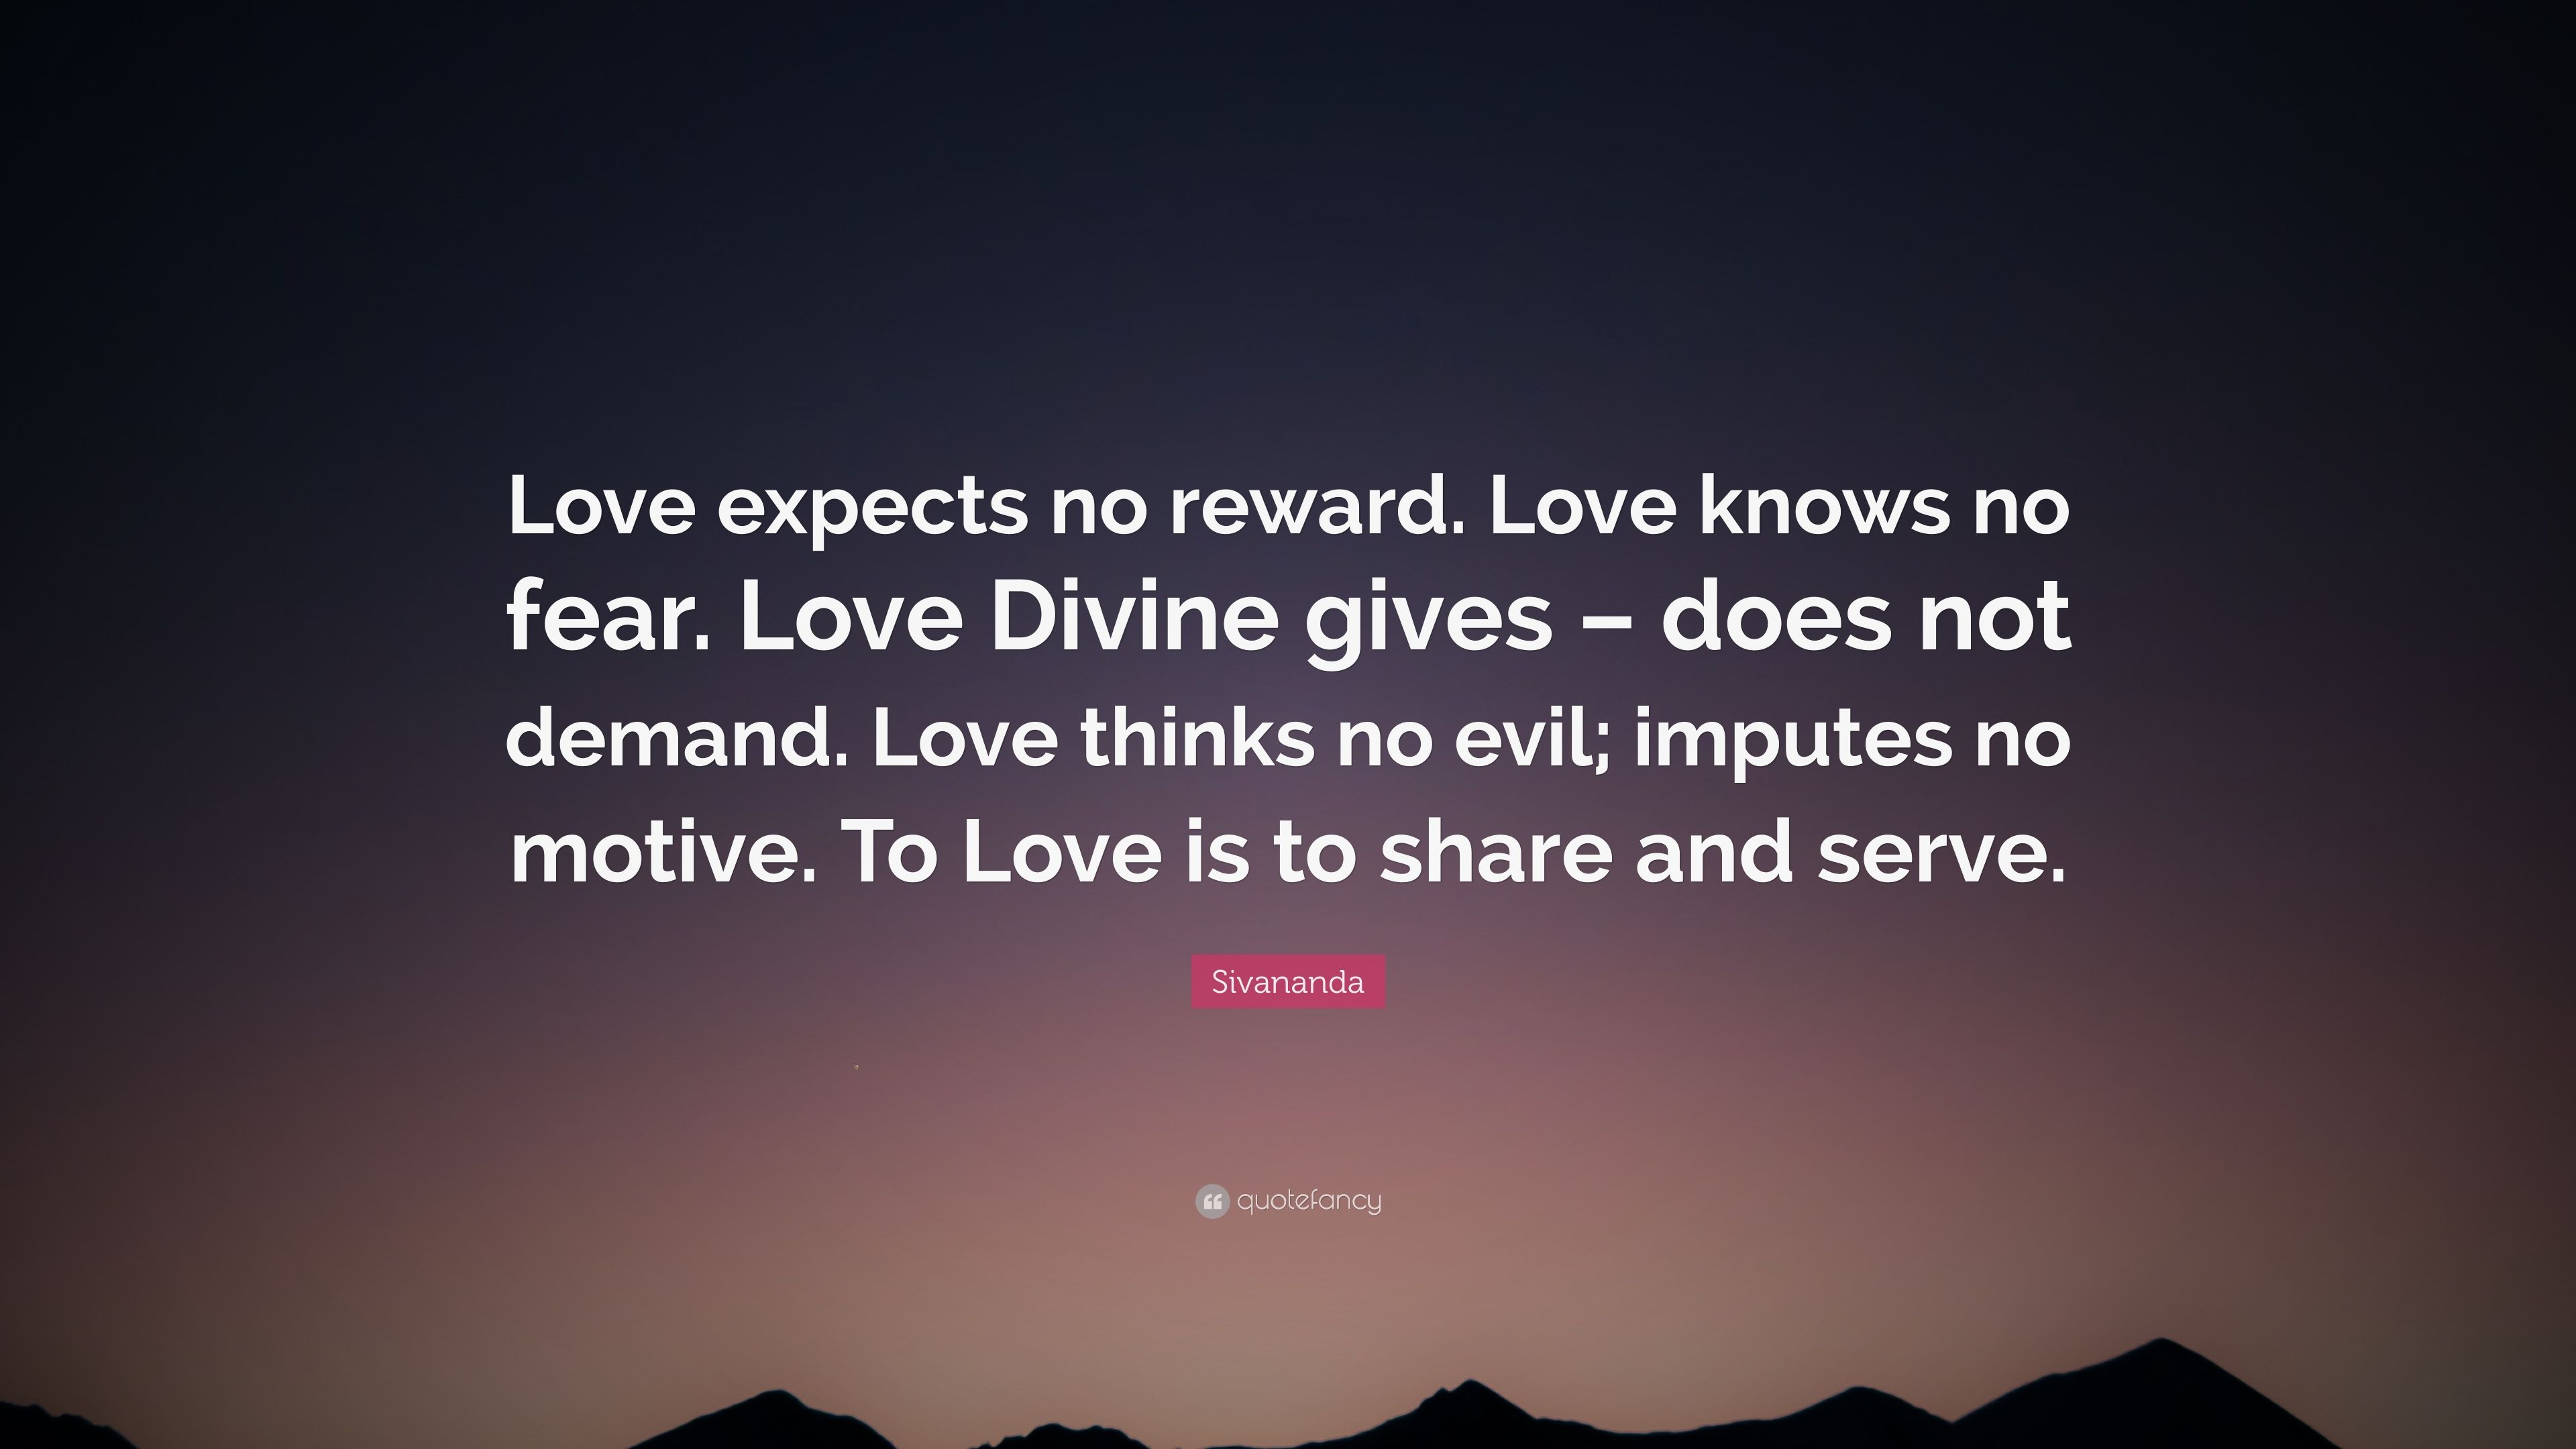 Sivananda Quote Love Expects No Reward Love Knows No Fear Love